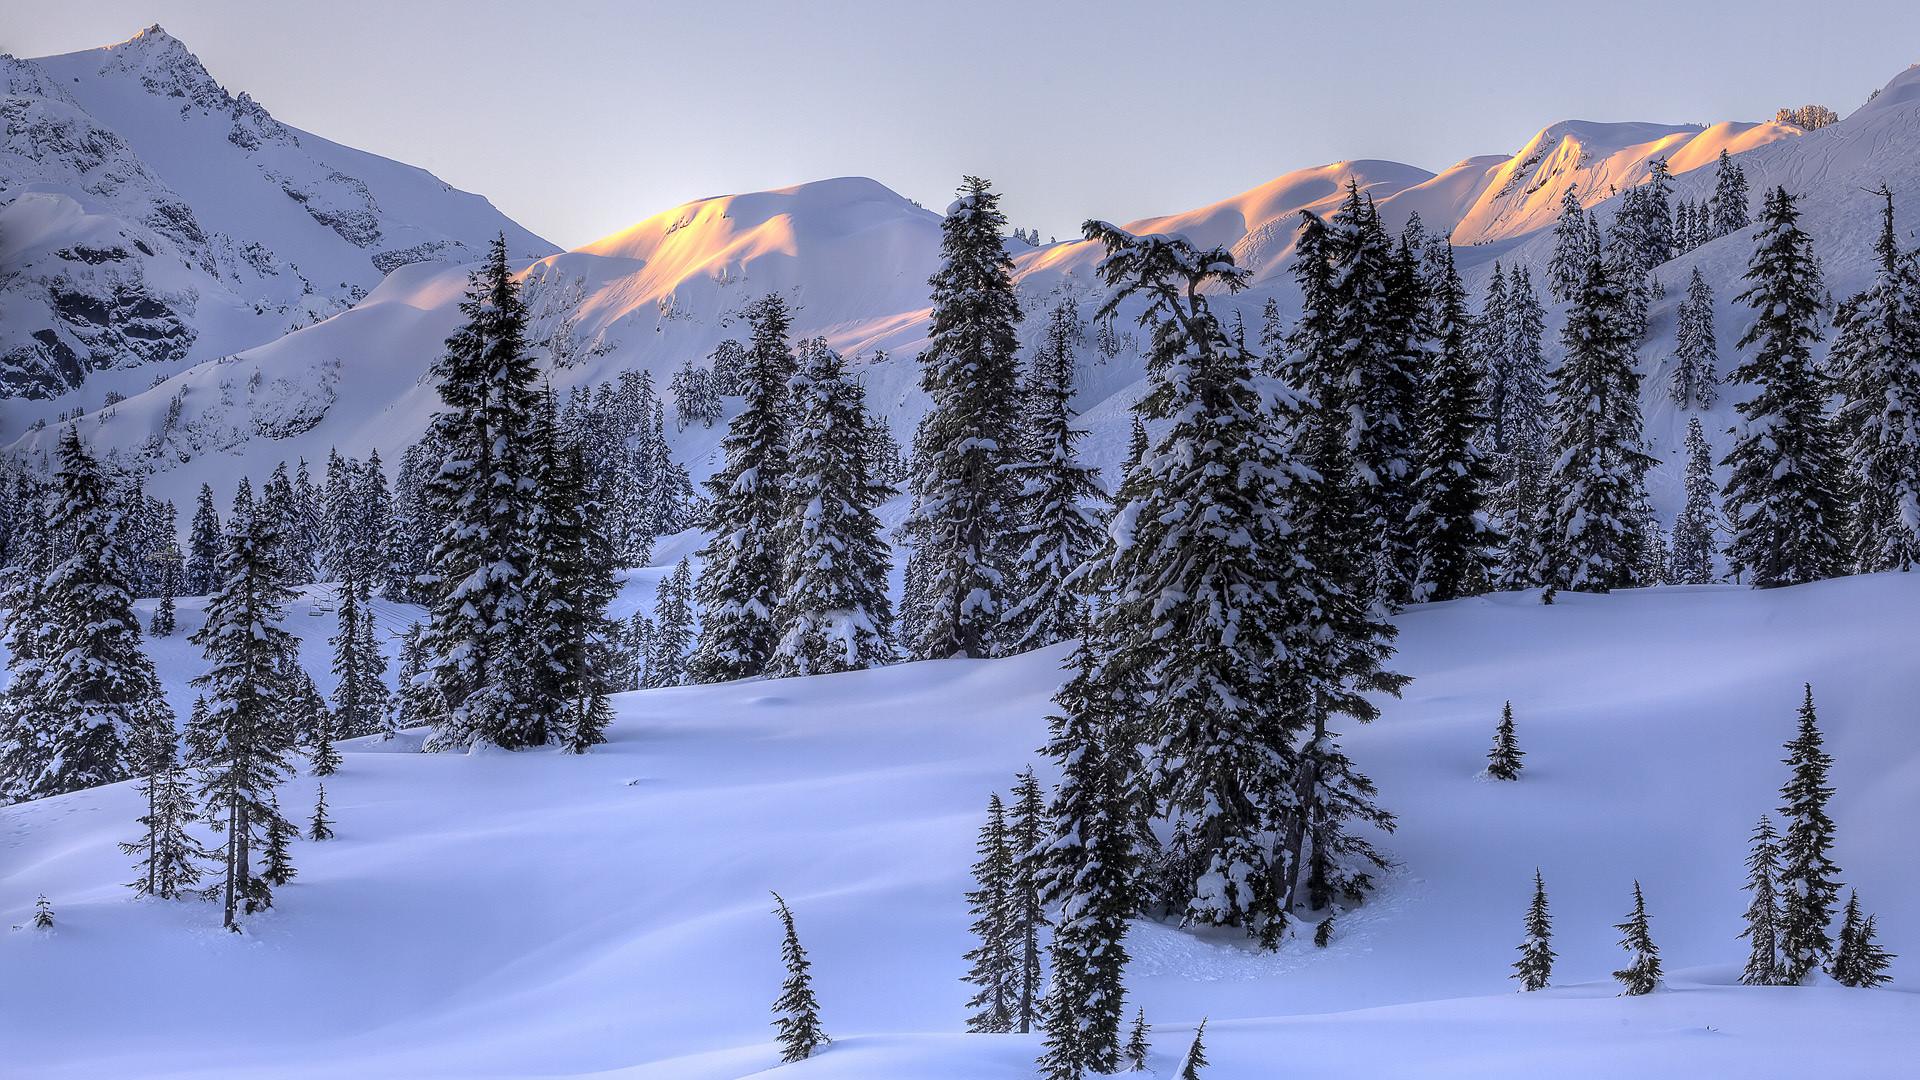 1080p Snow Scenes Vol.2 No.13 – 1920×1080 – PicRolls – Free Wallpaper